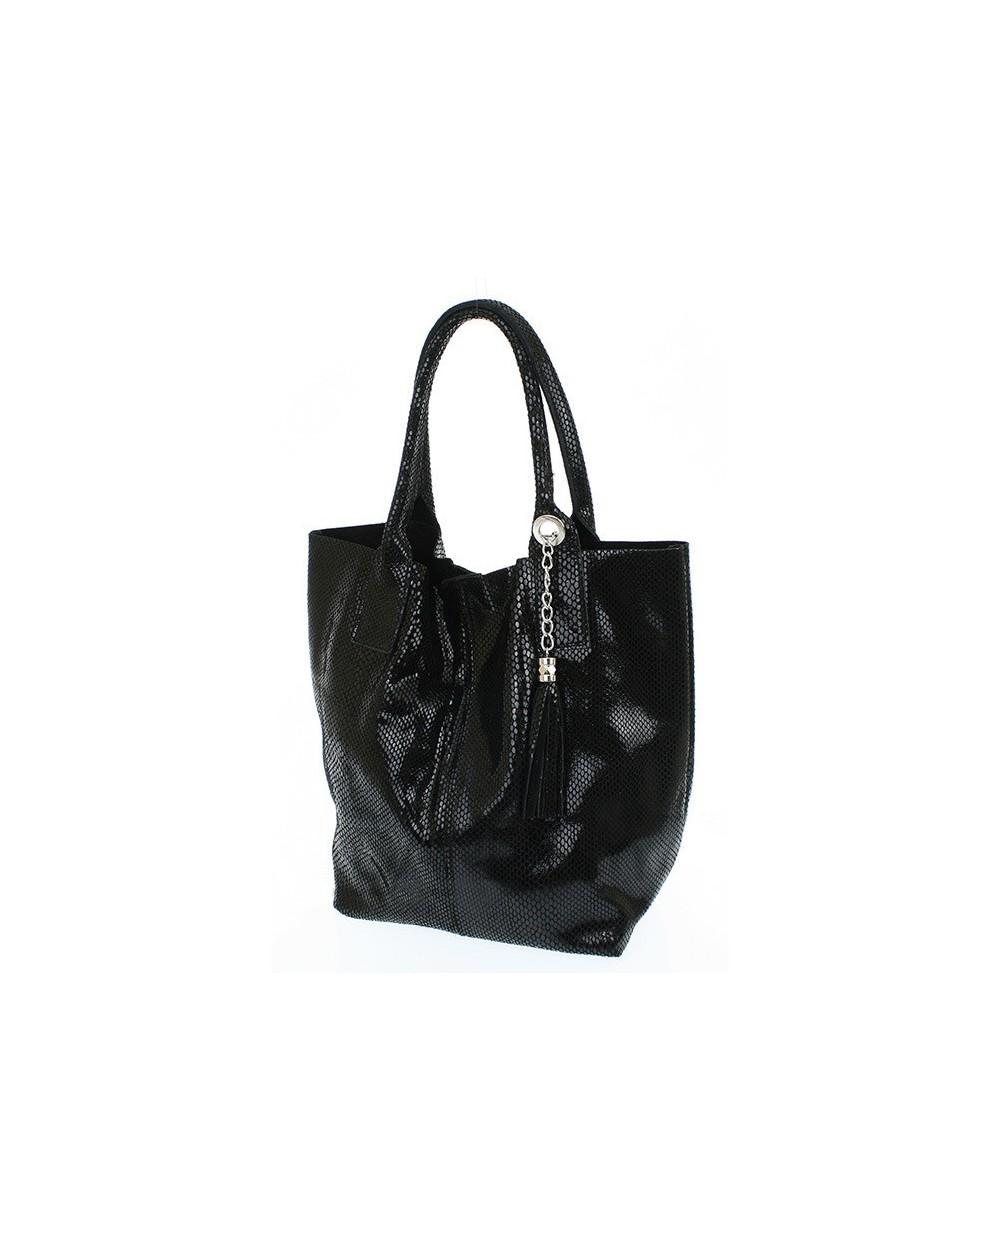 Włoska torebka vera pelle skóra węża shopper worek czarna